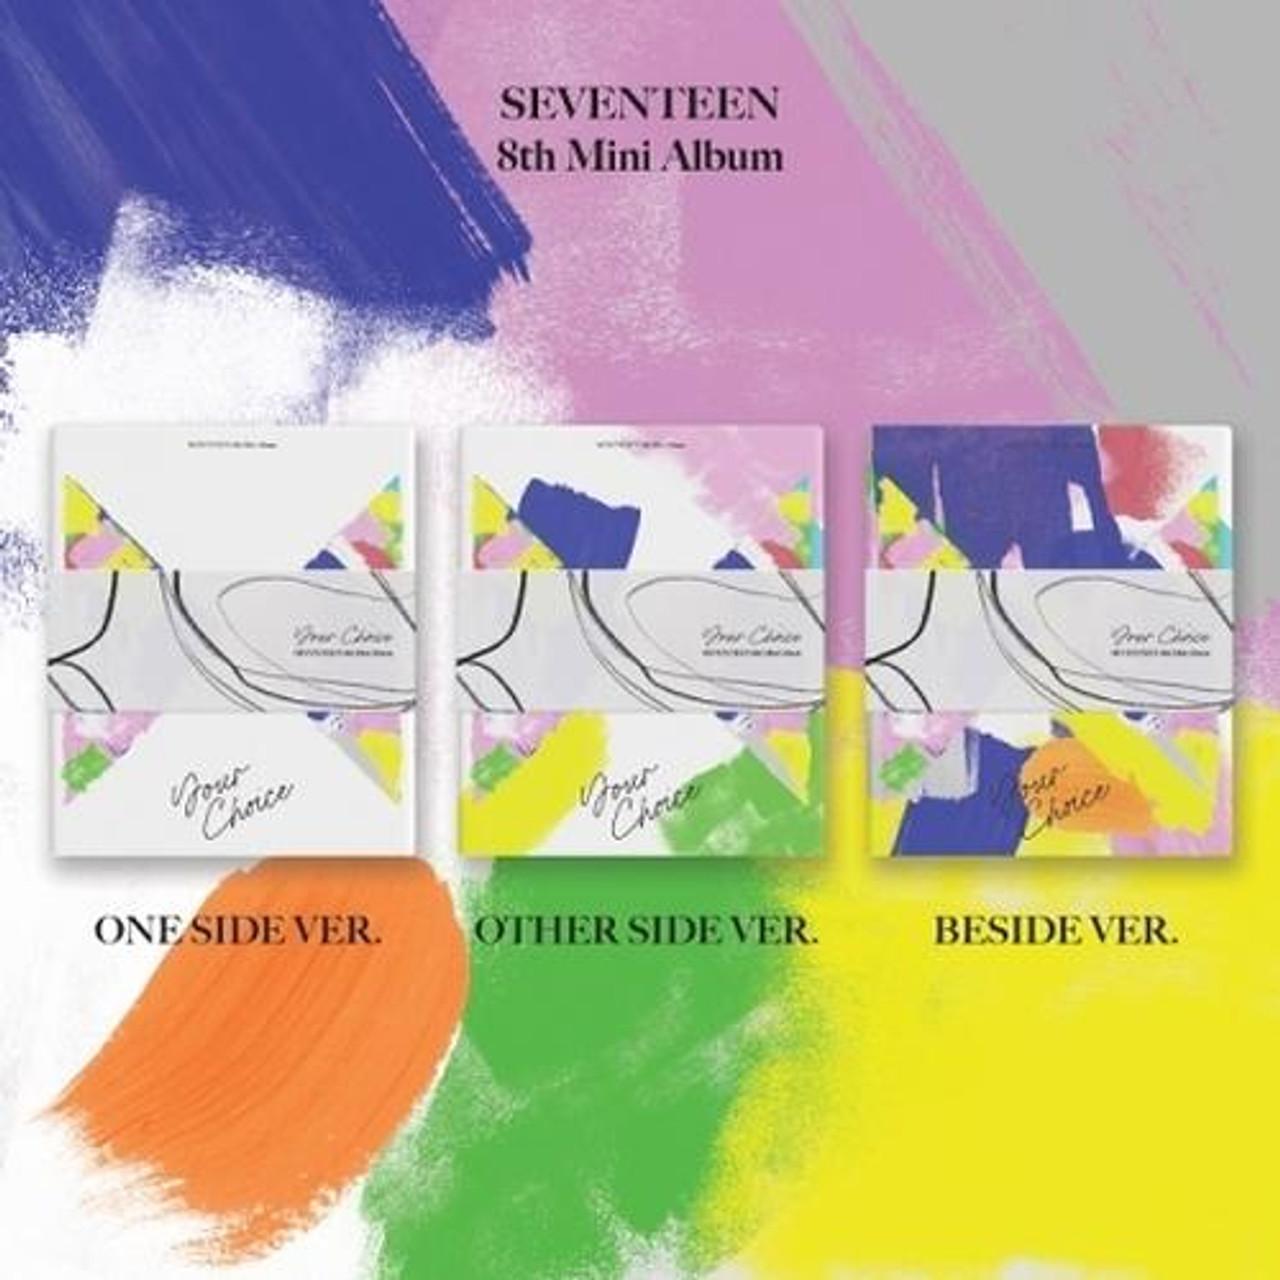 SEVENTEEN - 8th Mini [Your Choice] 3 Set Ver.